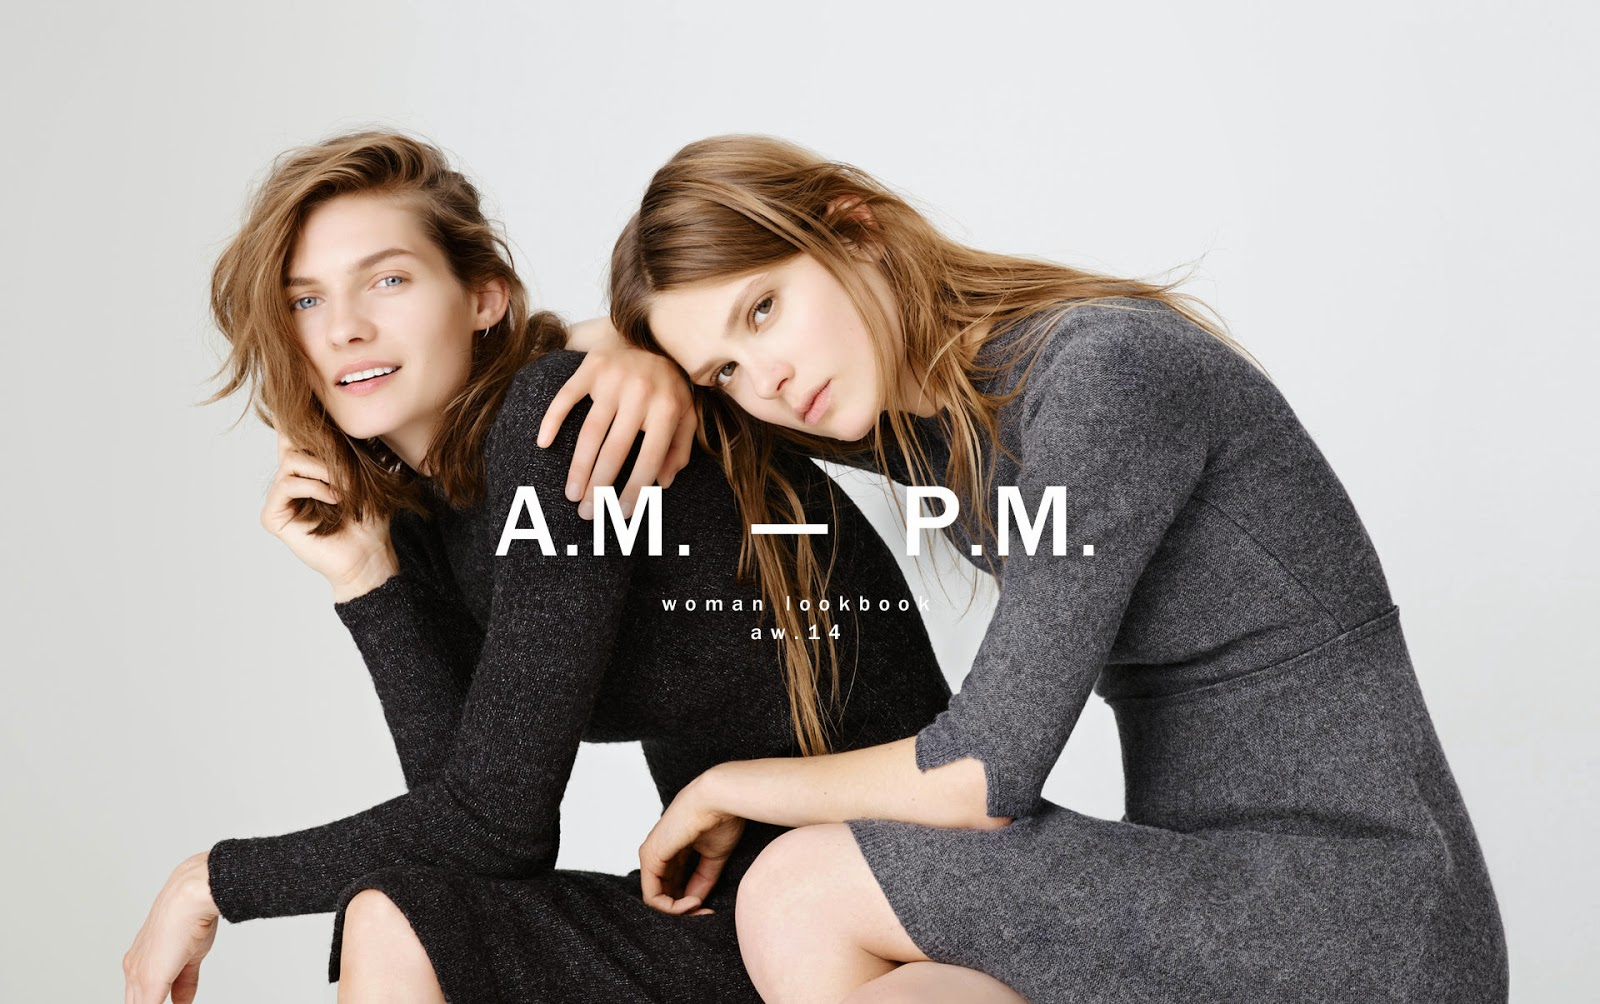 Zara November Lookbook Moda Fashion Trends Tendencias Otoño 2014 Imagen